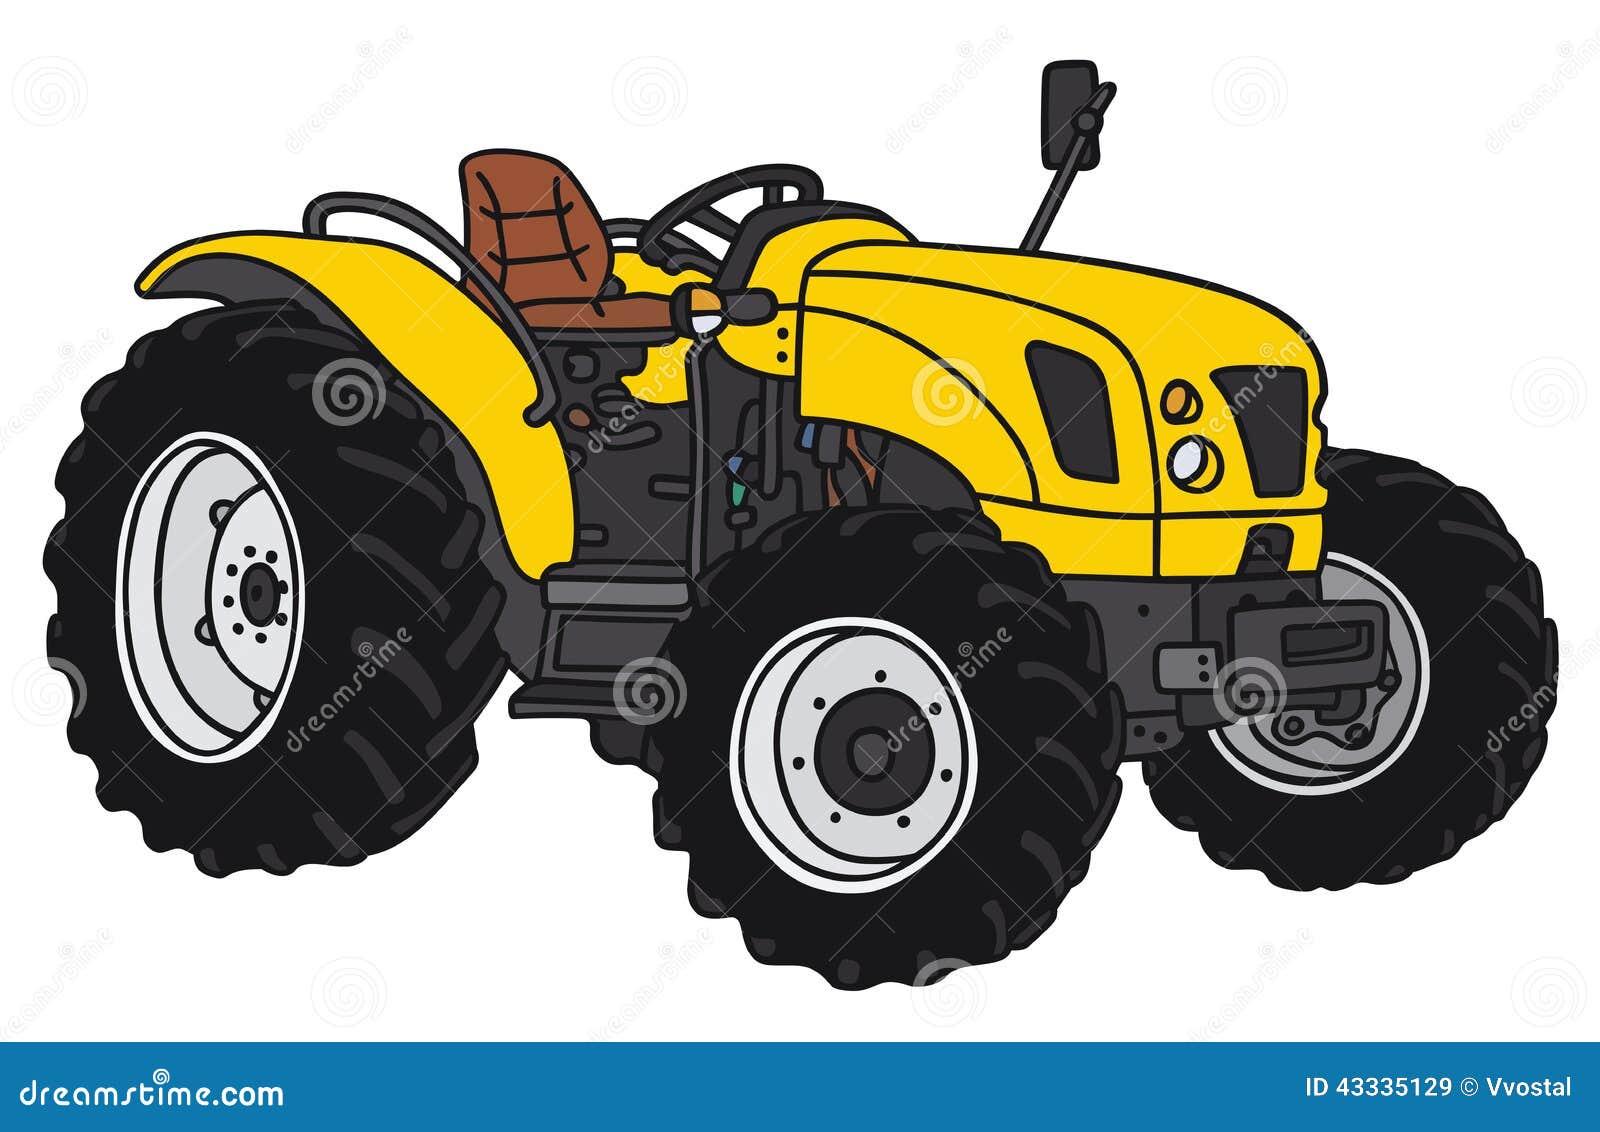 Small Tractor Cartoon : Tractor stock vector image